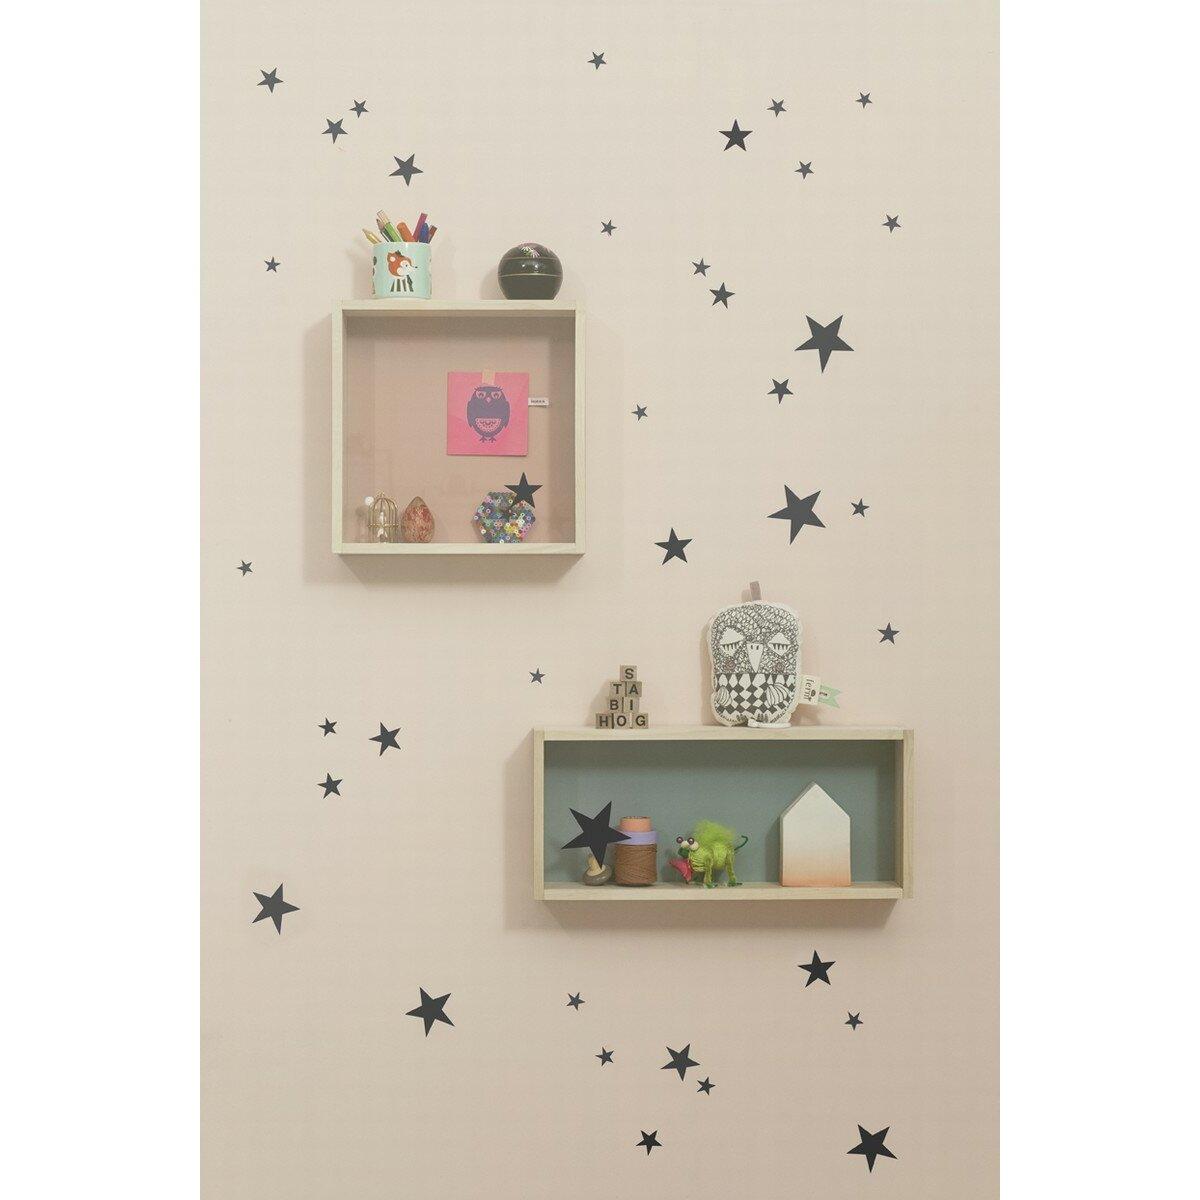 ferm living mini stars wall decal reviews wayfair. Black Bedroom Furniture Sets. Home Design Ideas